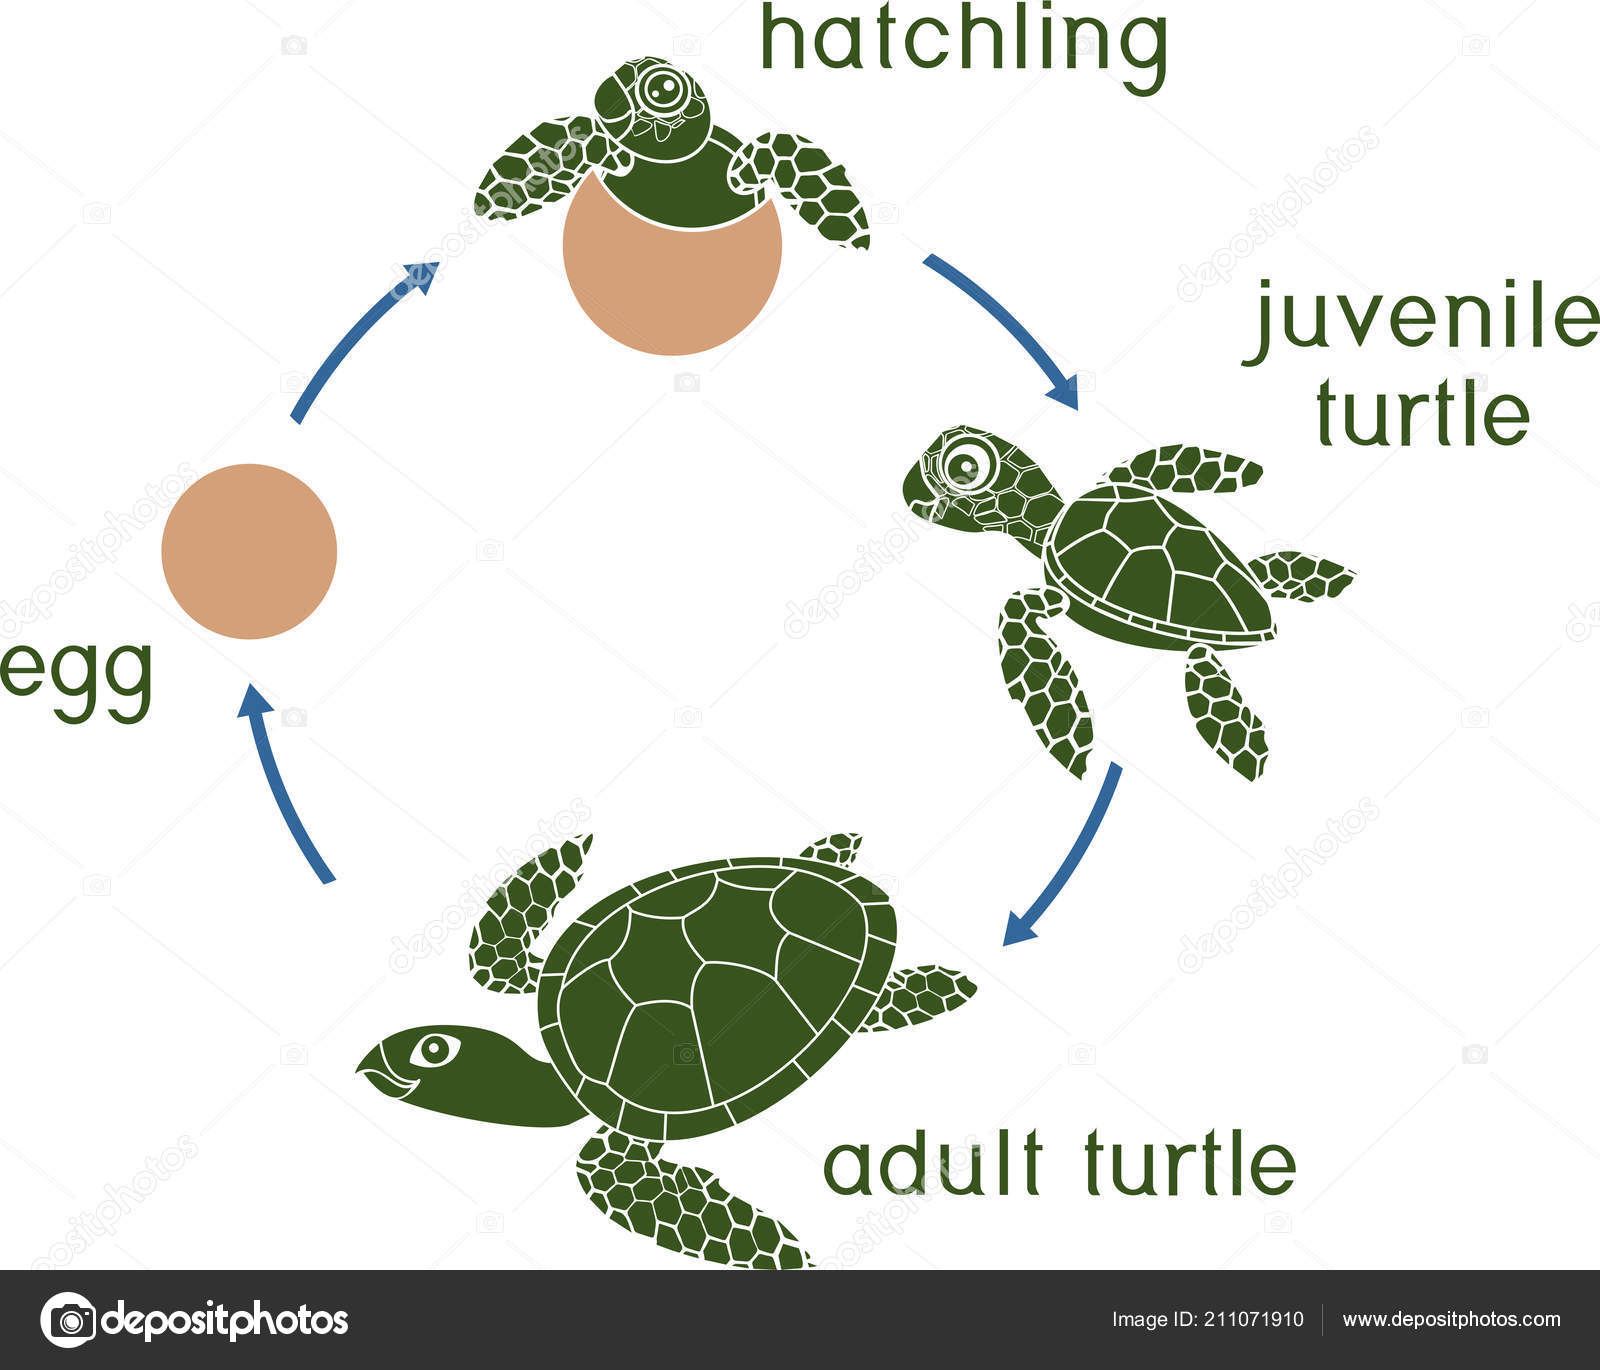 Ciclo Vida Das Tartarugas Marinhas Sequencia Fases Evolucao Tartaruga Ovo